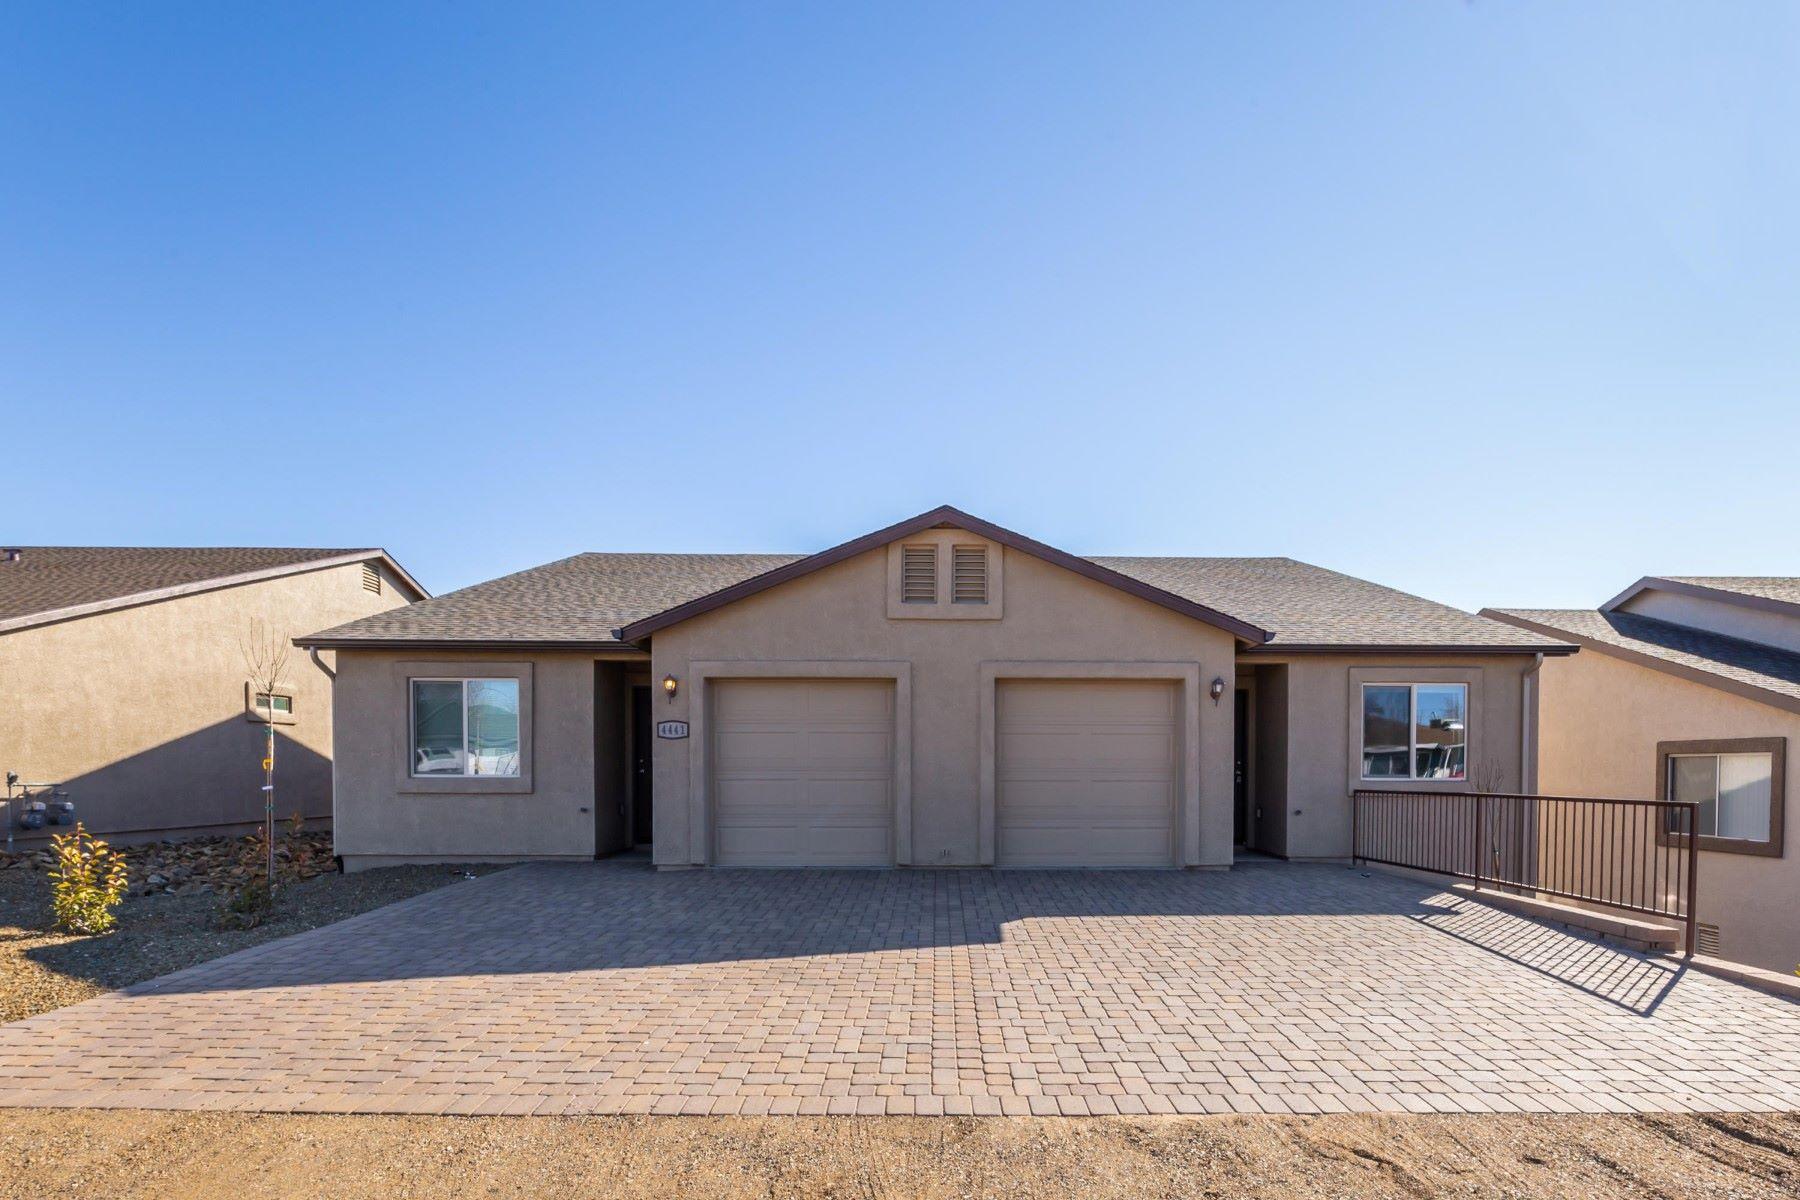 Multi-Family Homes 为 销售 在 8701 Spouse Drive 普雷斯科特谷, 亚利桑那州 86314 美国